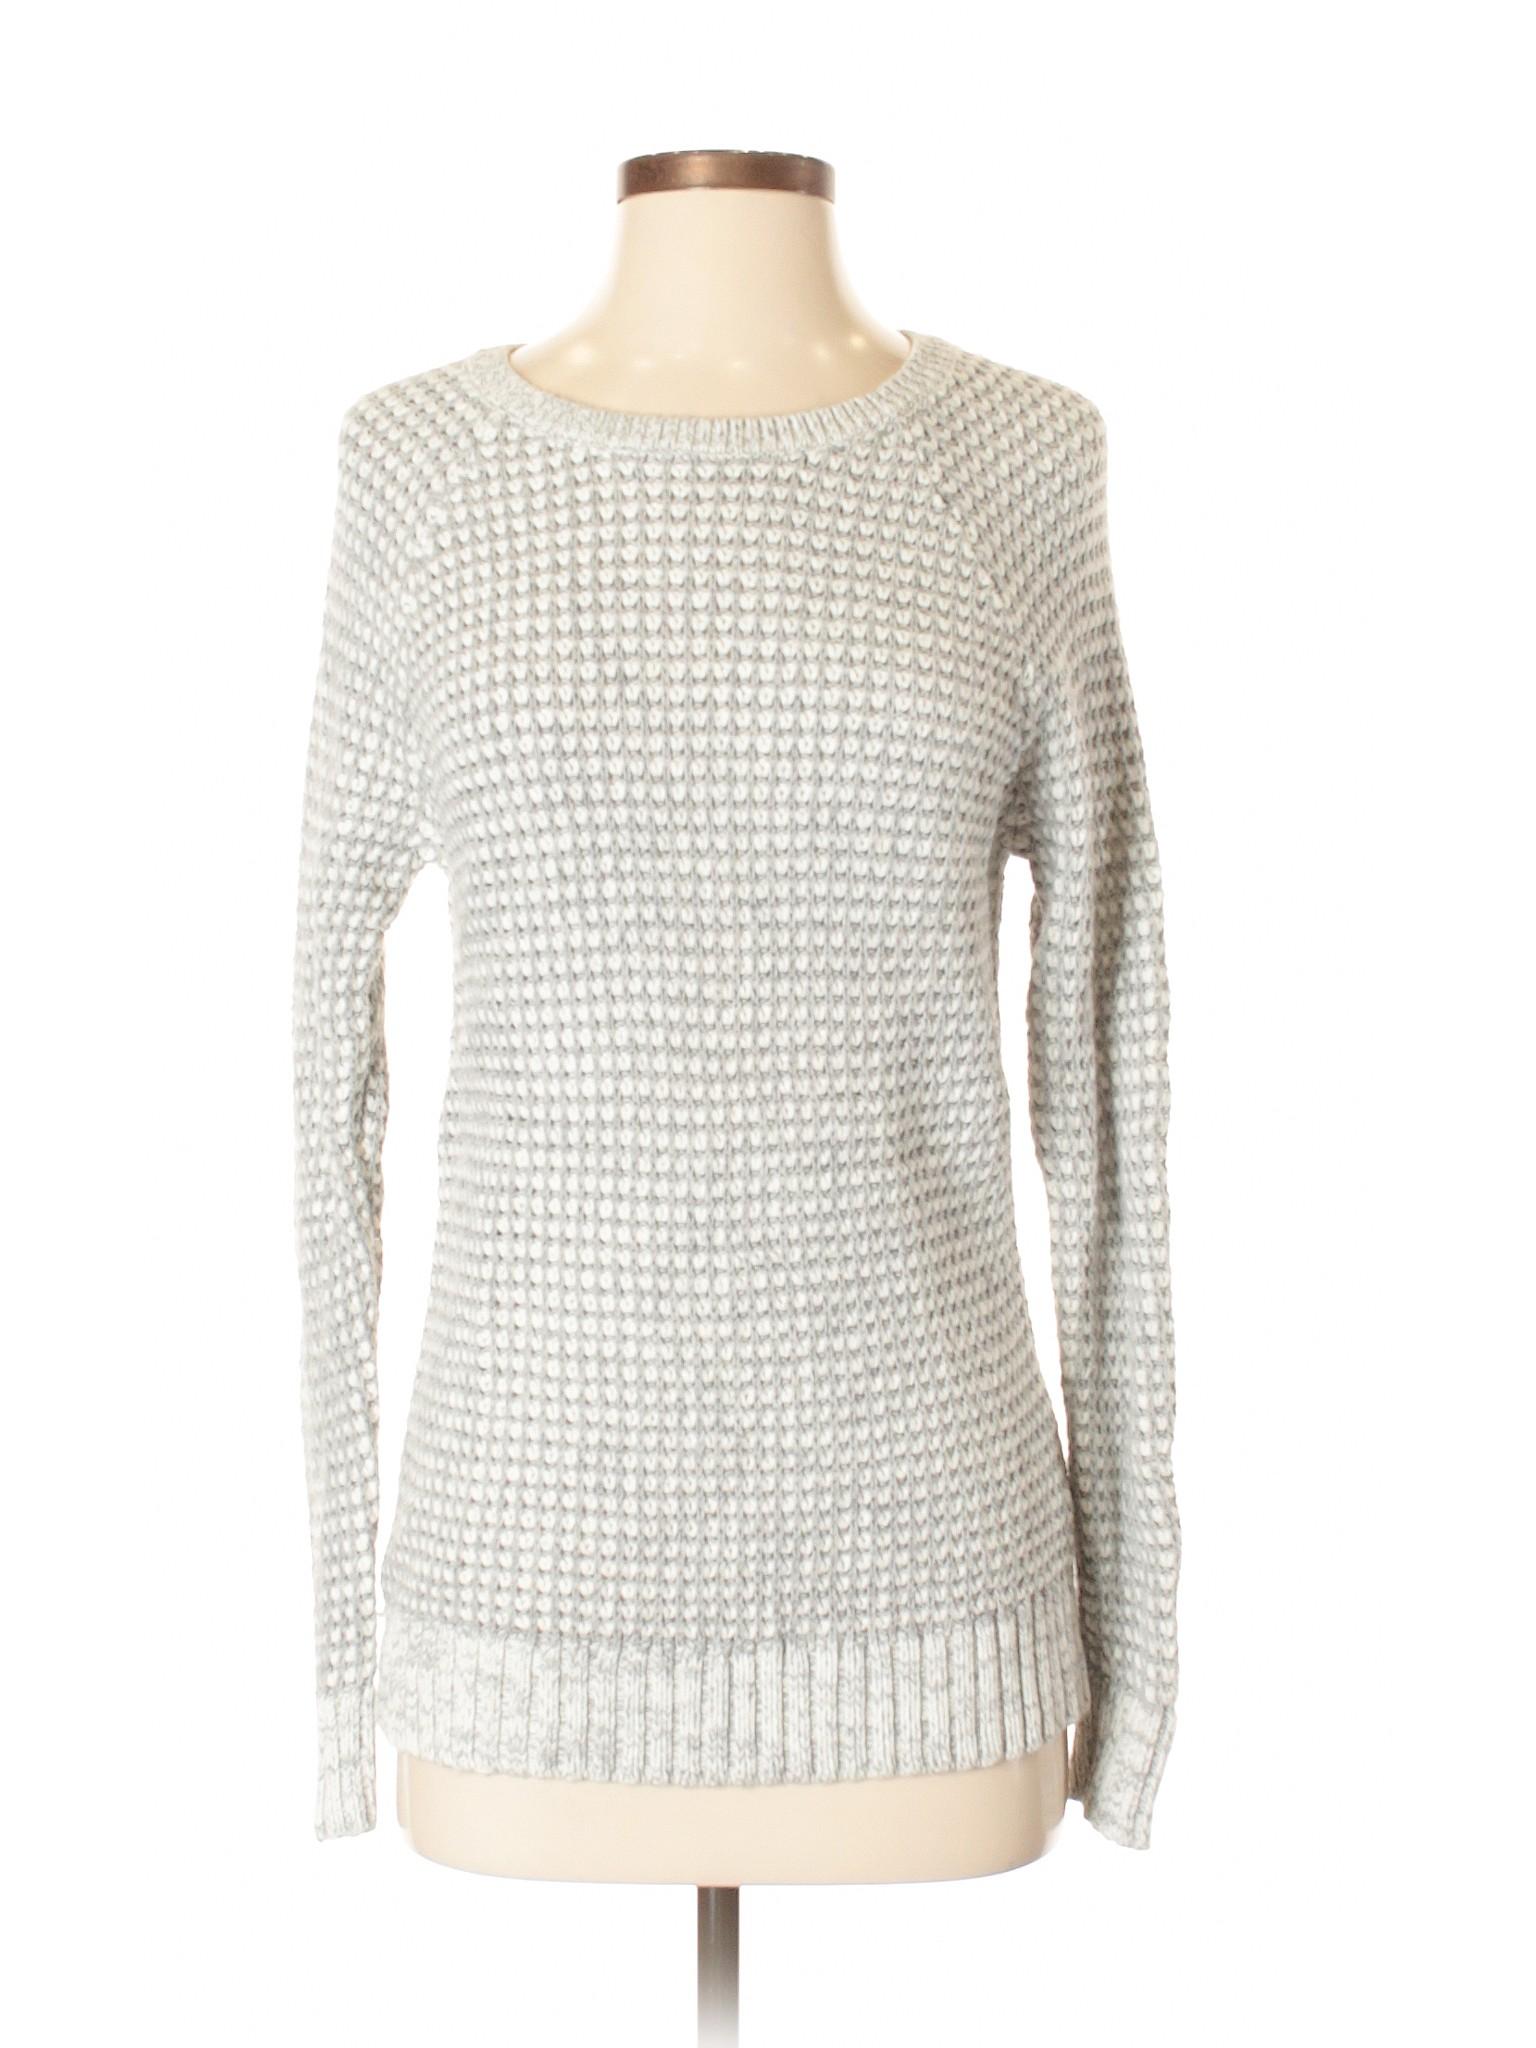 winter Republic Banana Pullover Sweater Boutique Factory Store aq1wxCadR